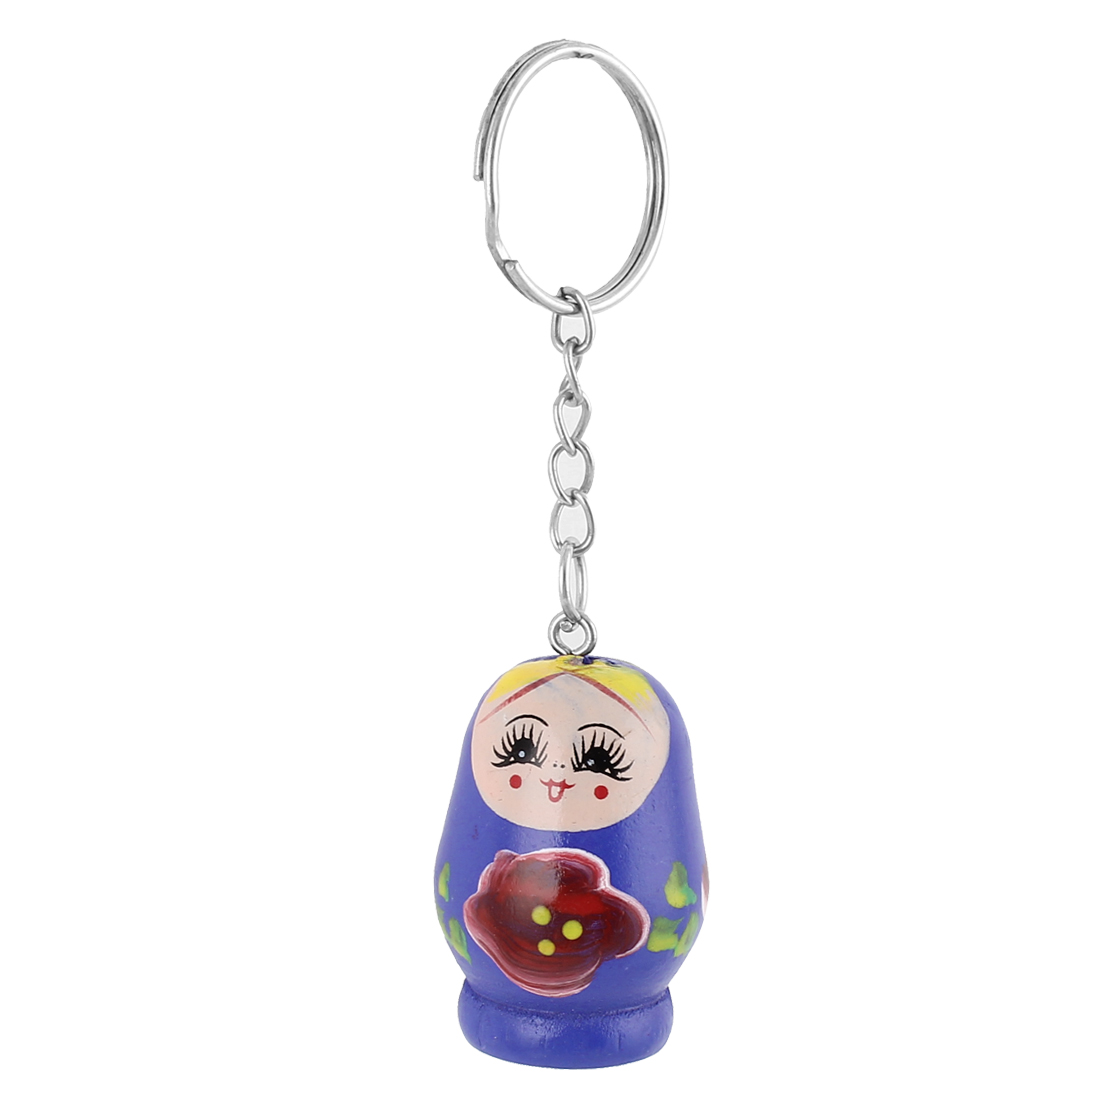 Wooden Matryoshka Style Painted Nesting Doll Key Holder Keychain Keyring Purple